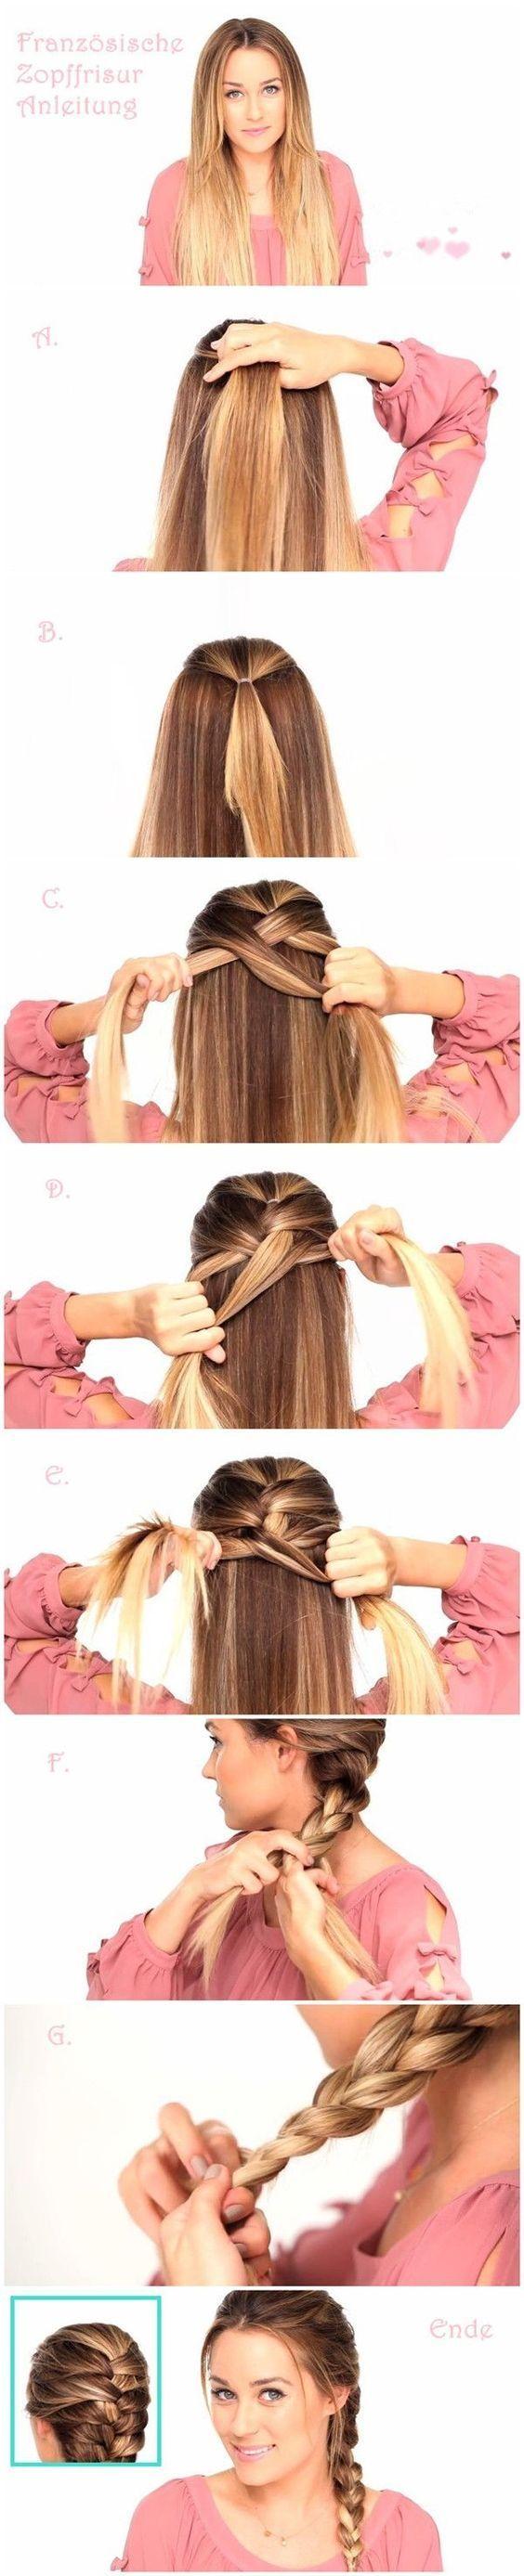 15 Cute 5 Minute Hairstyles For School In 2018 Hair Pinterest